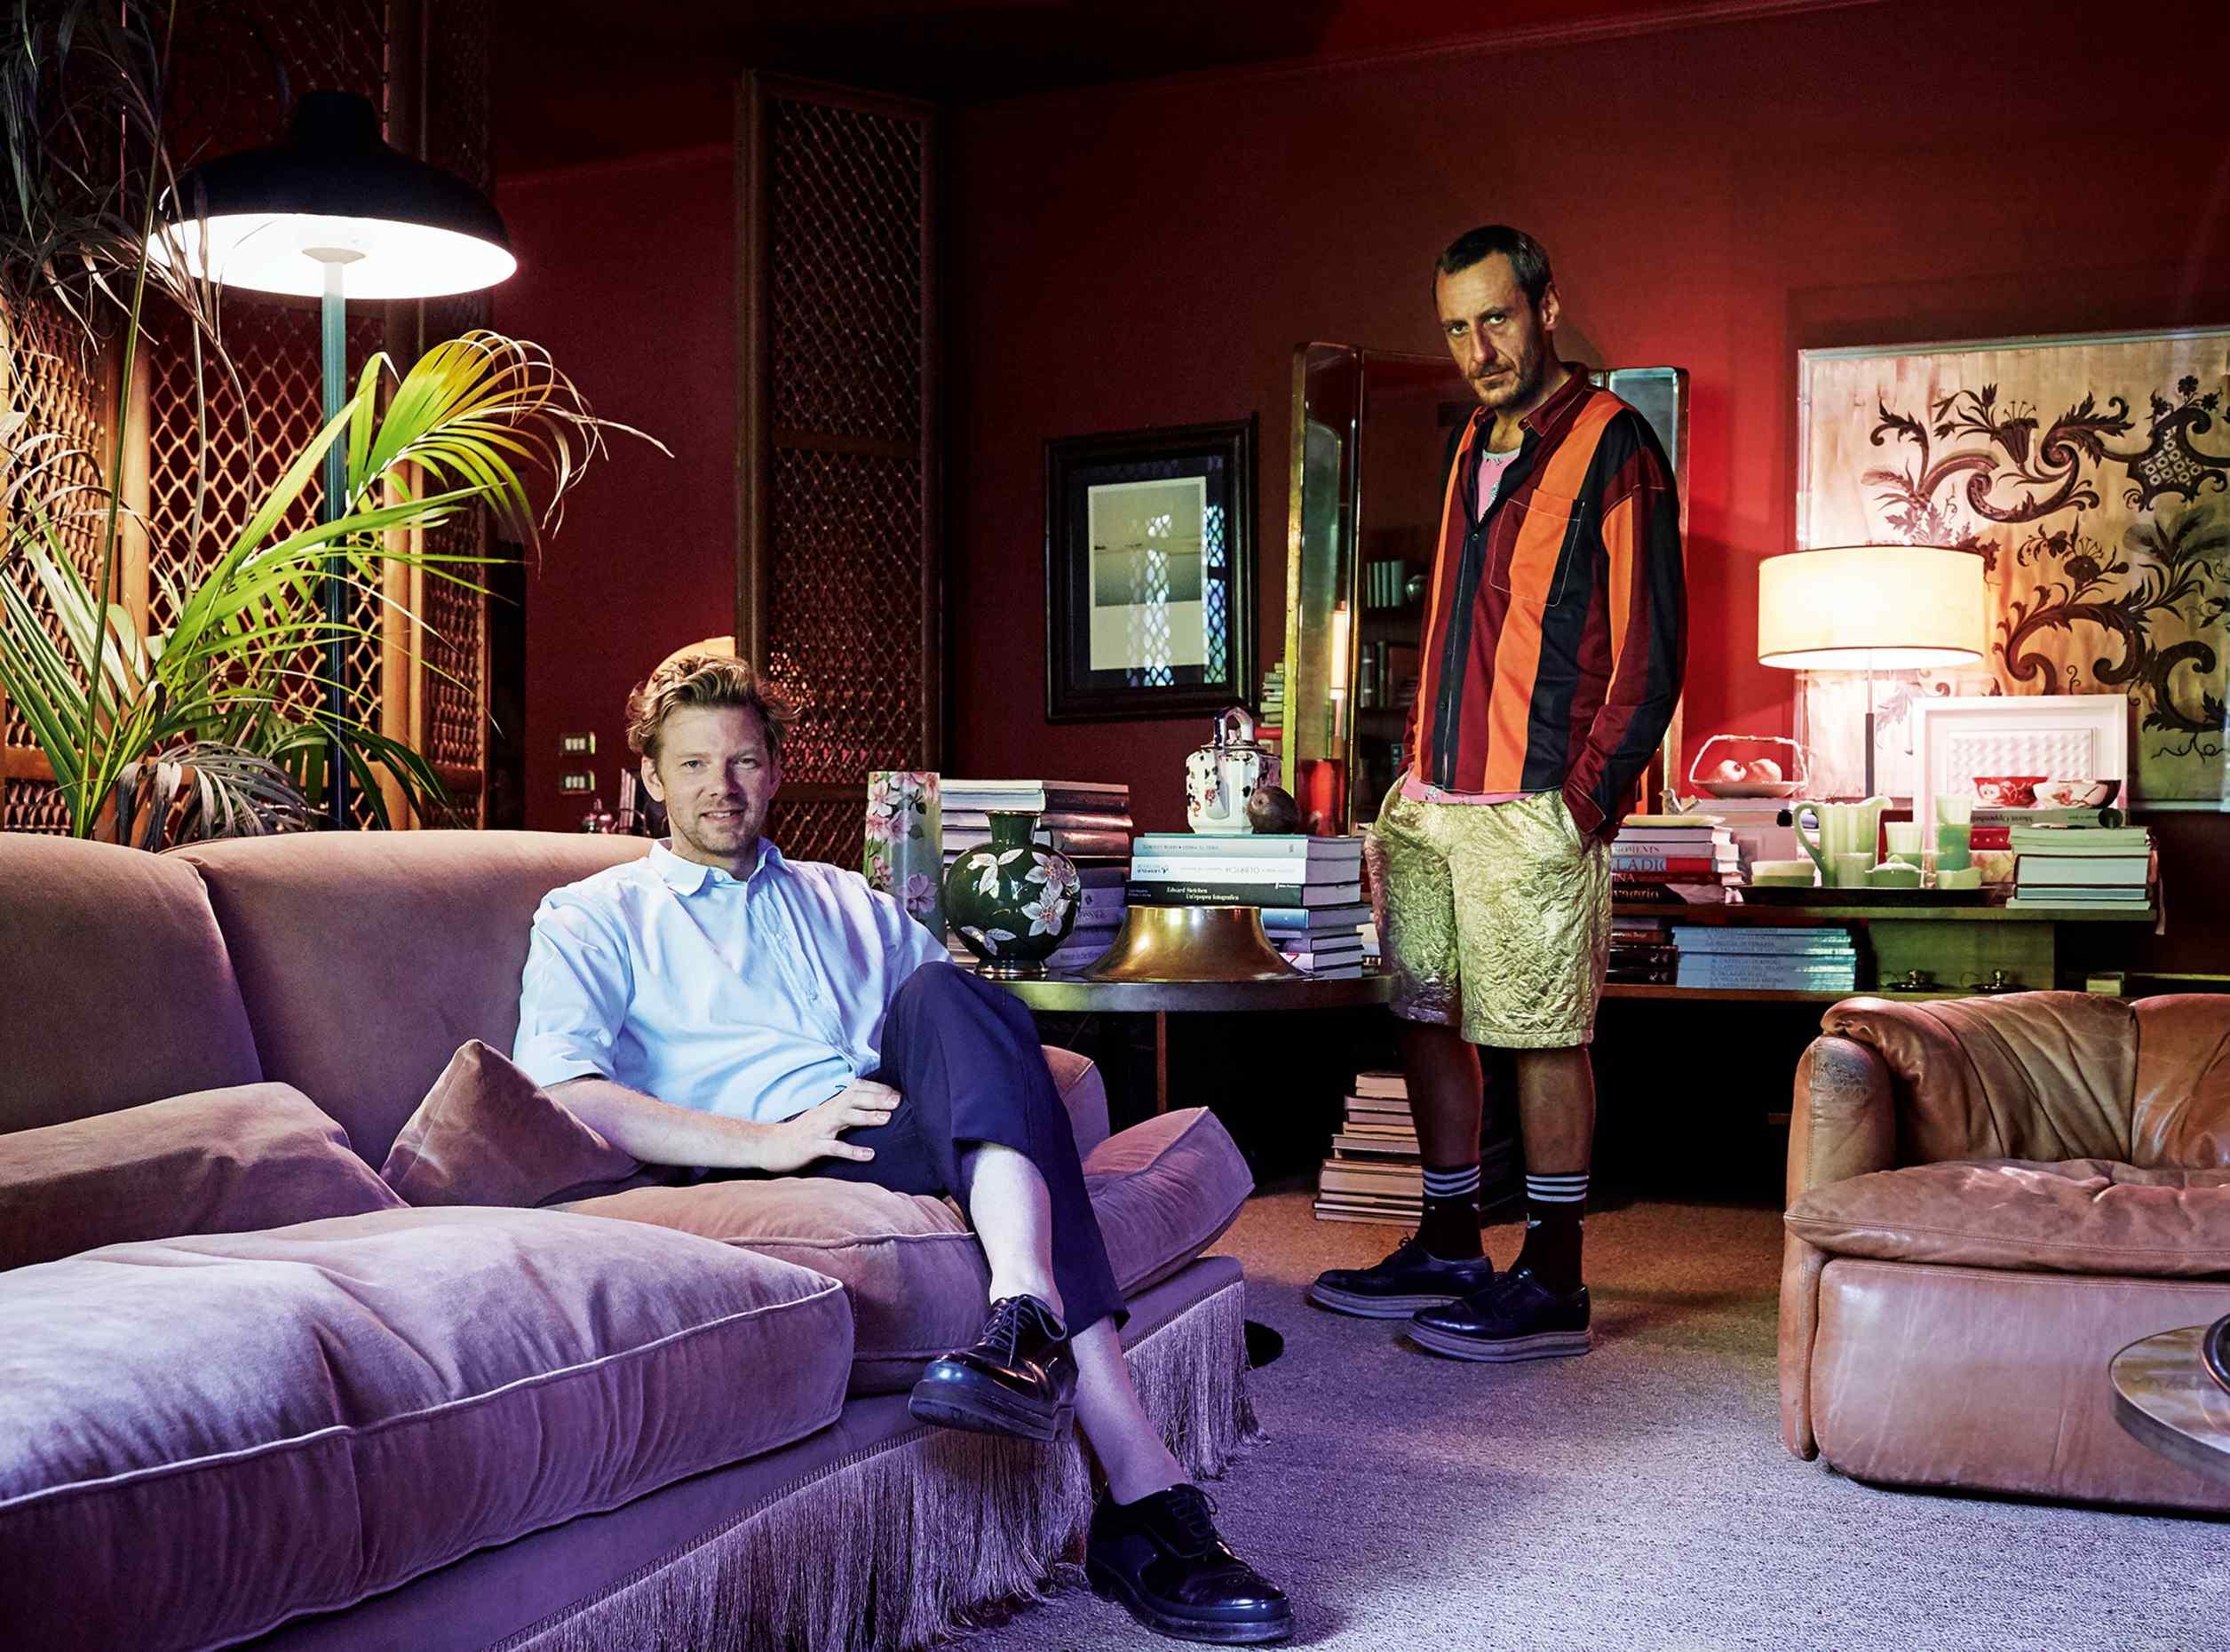 DimoreStudio's Britt Moran (left) and Emiliano Salci at home in Milan - Photo by Mattia Zoppellaro - milan design week 2018 - best interior designer in milan - top interior designers in italy - italian furniture - luxury furniture